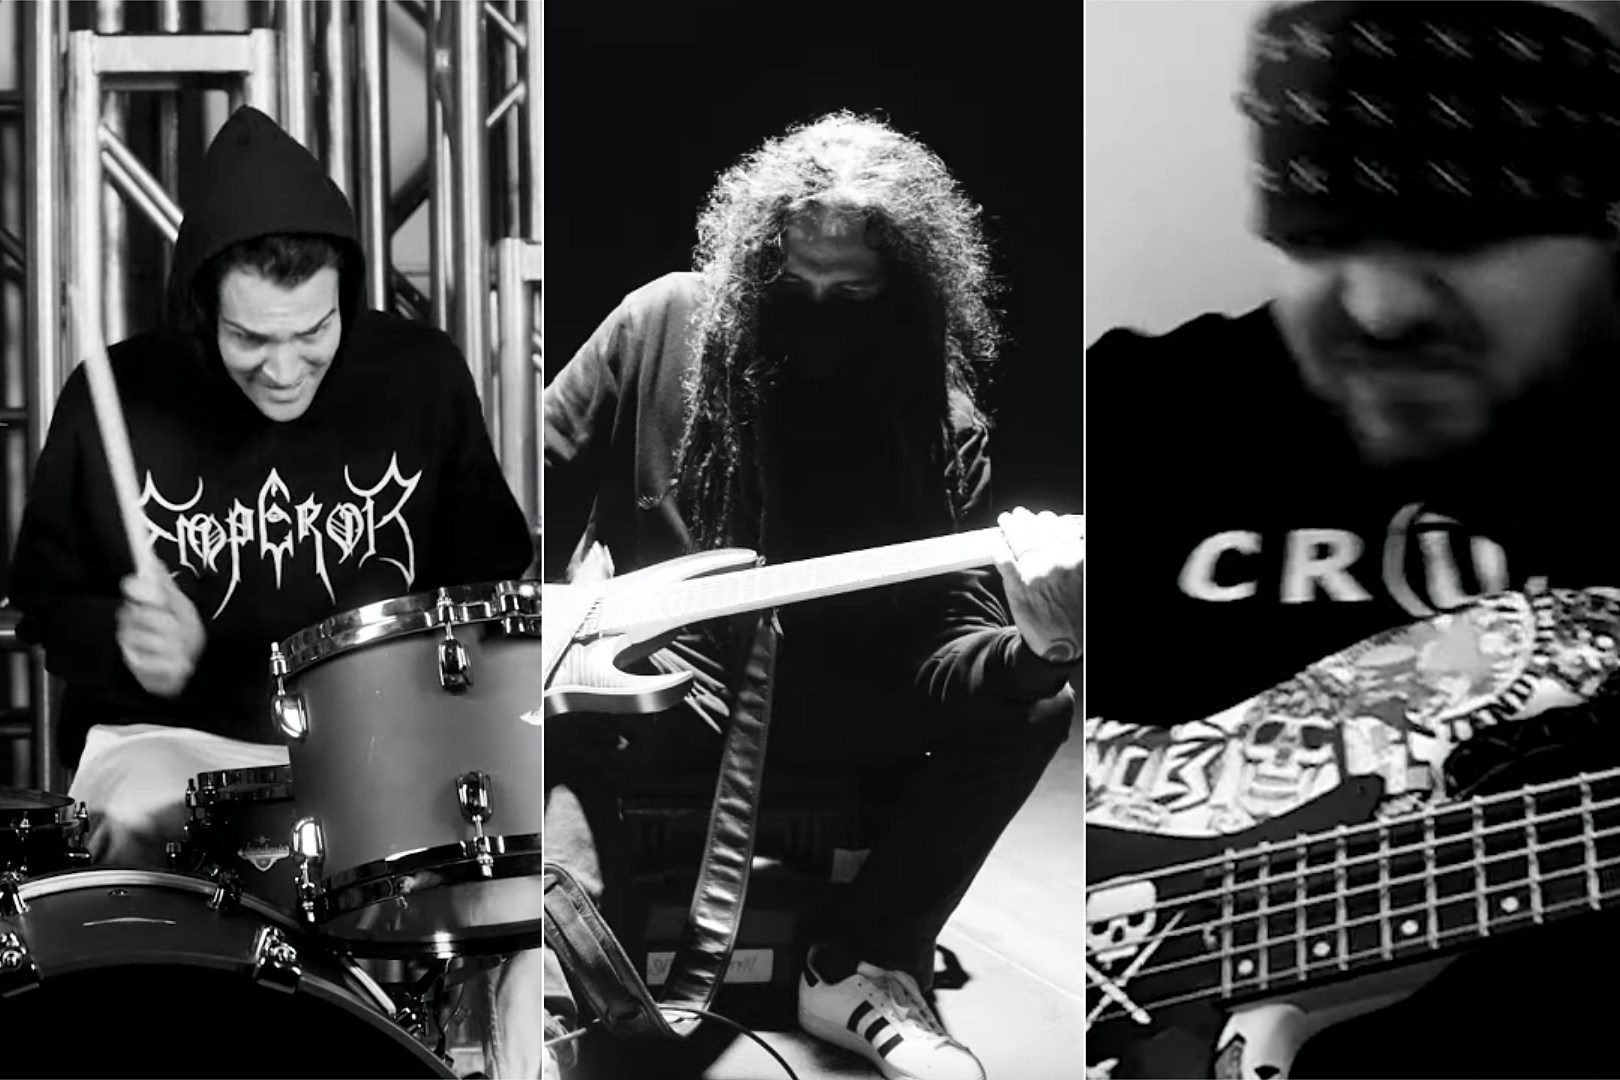 Hear Fever 333, Korn + Suicidal Tendencies Members' Noise Collab